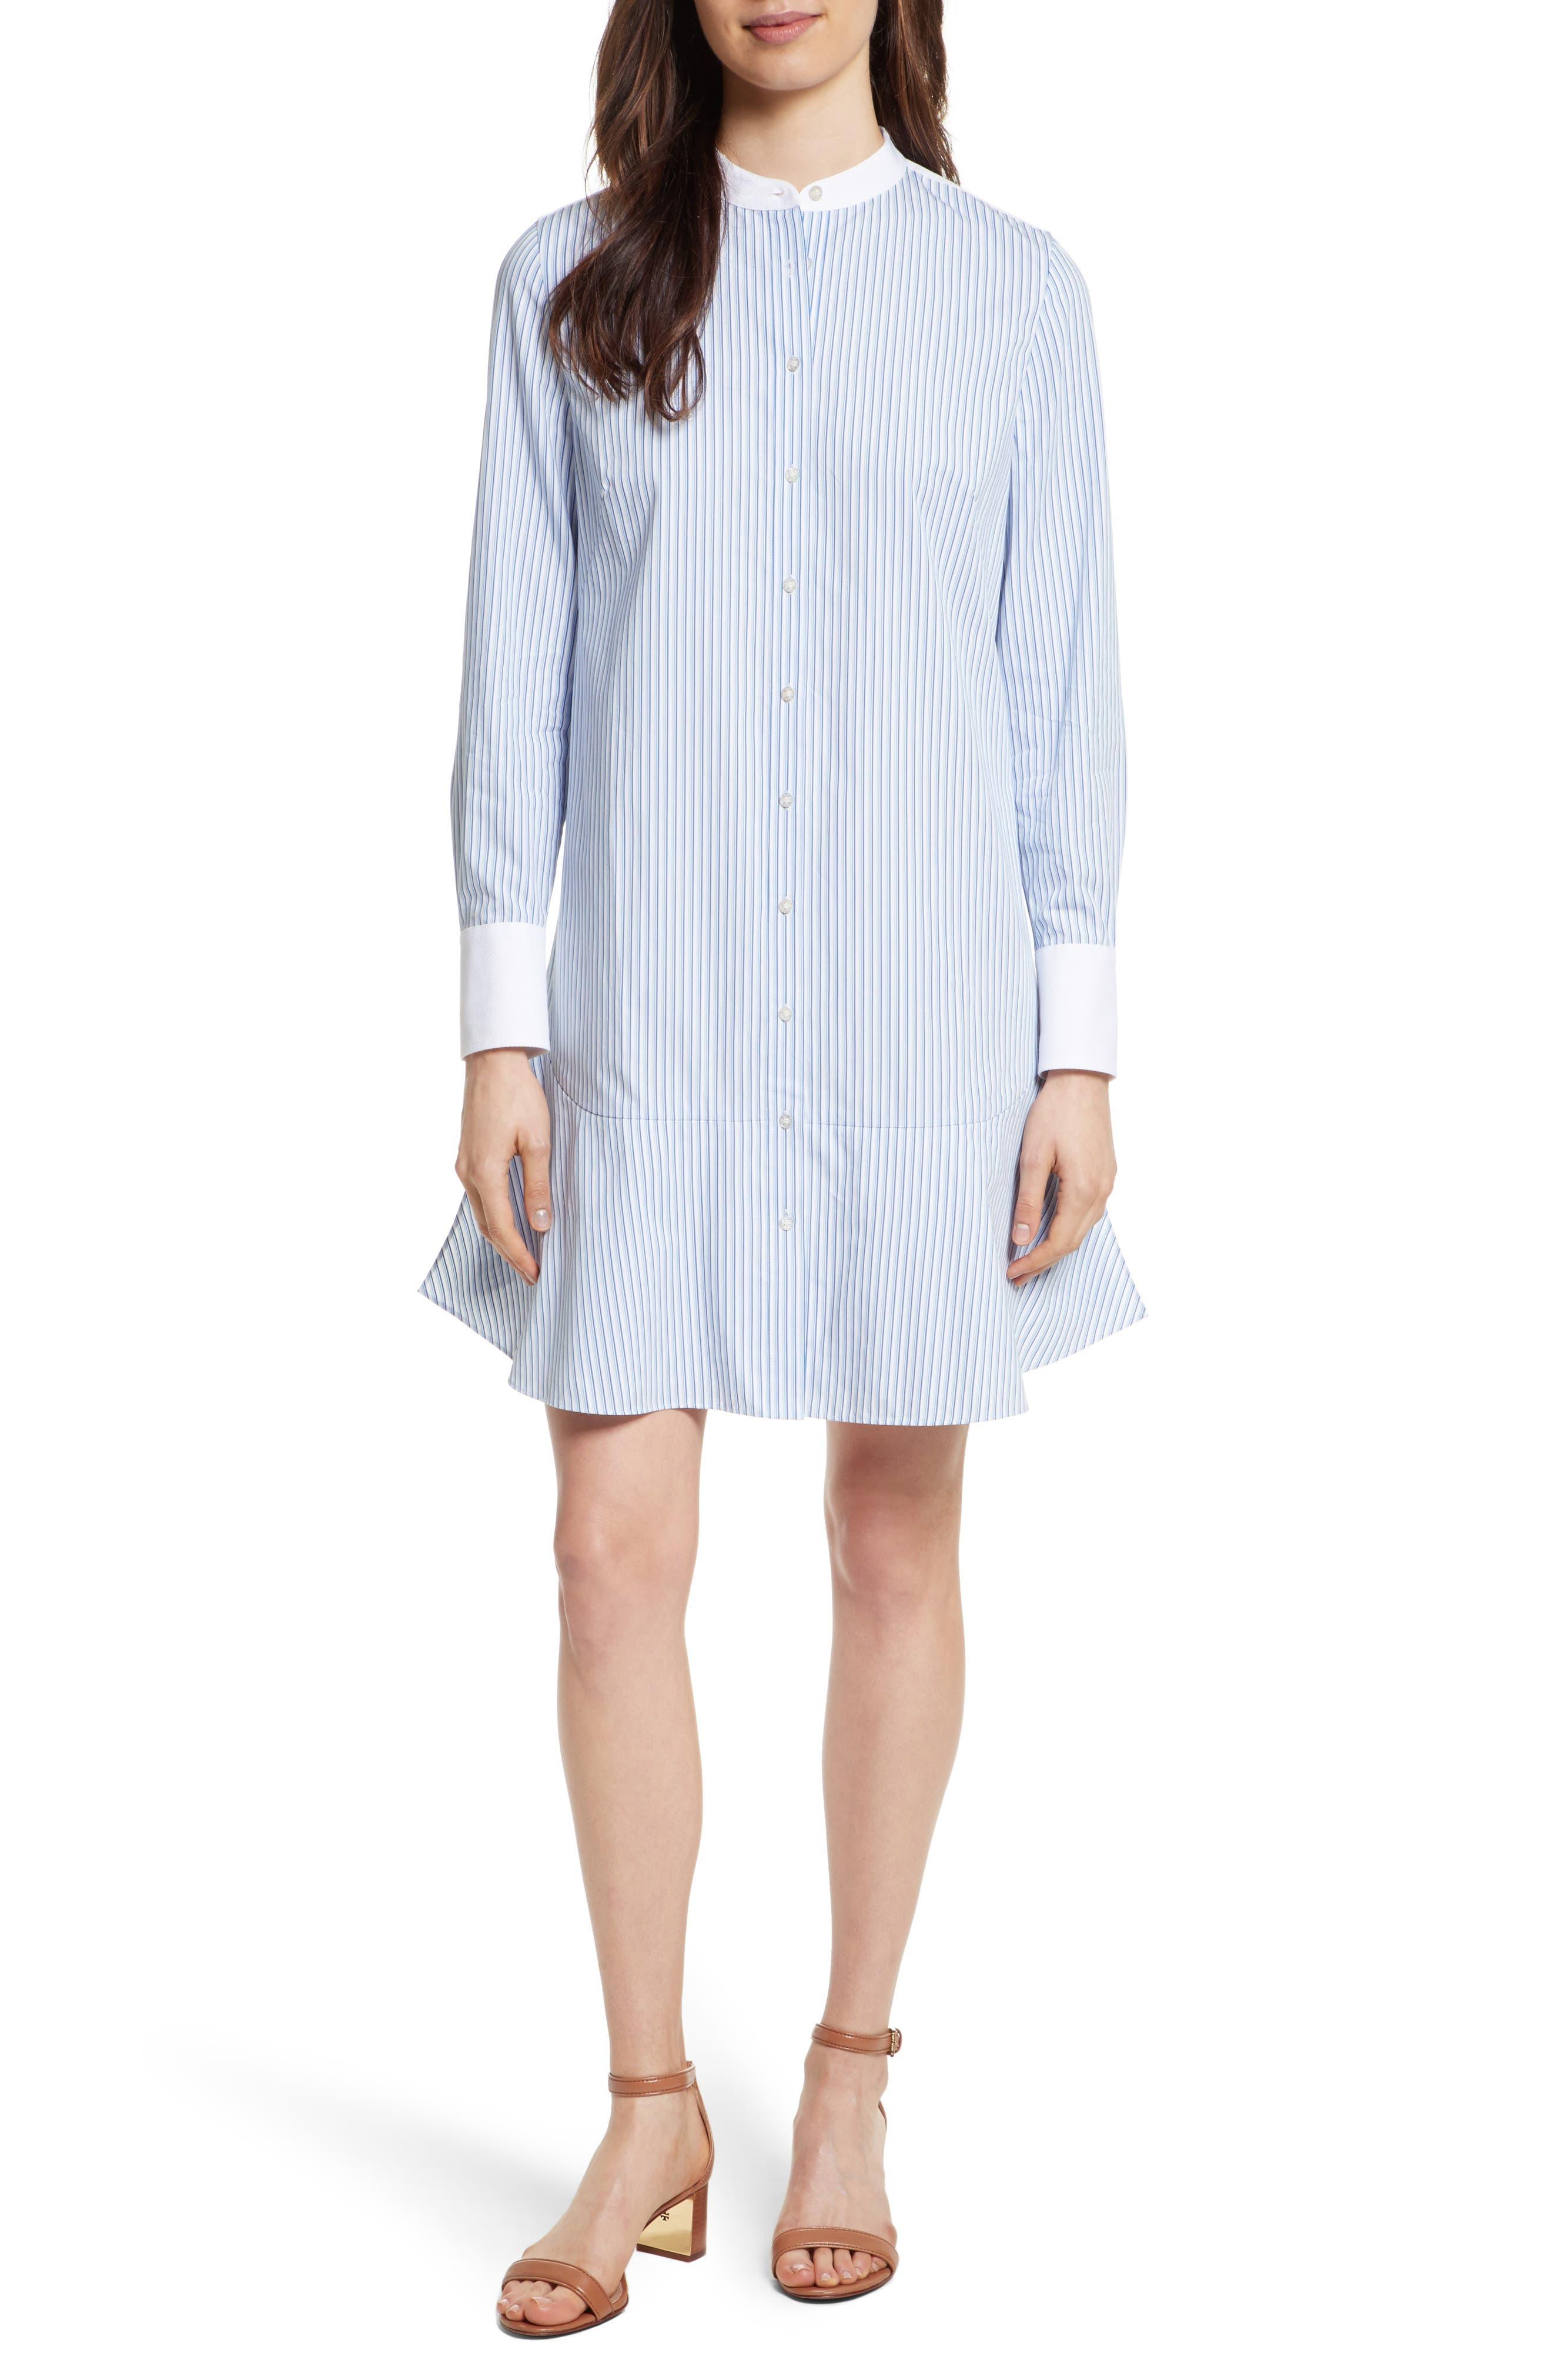 Main Image - Tory Burch Cora Stripe Shirtdress